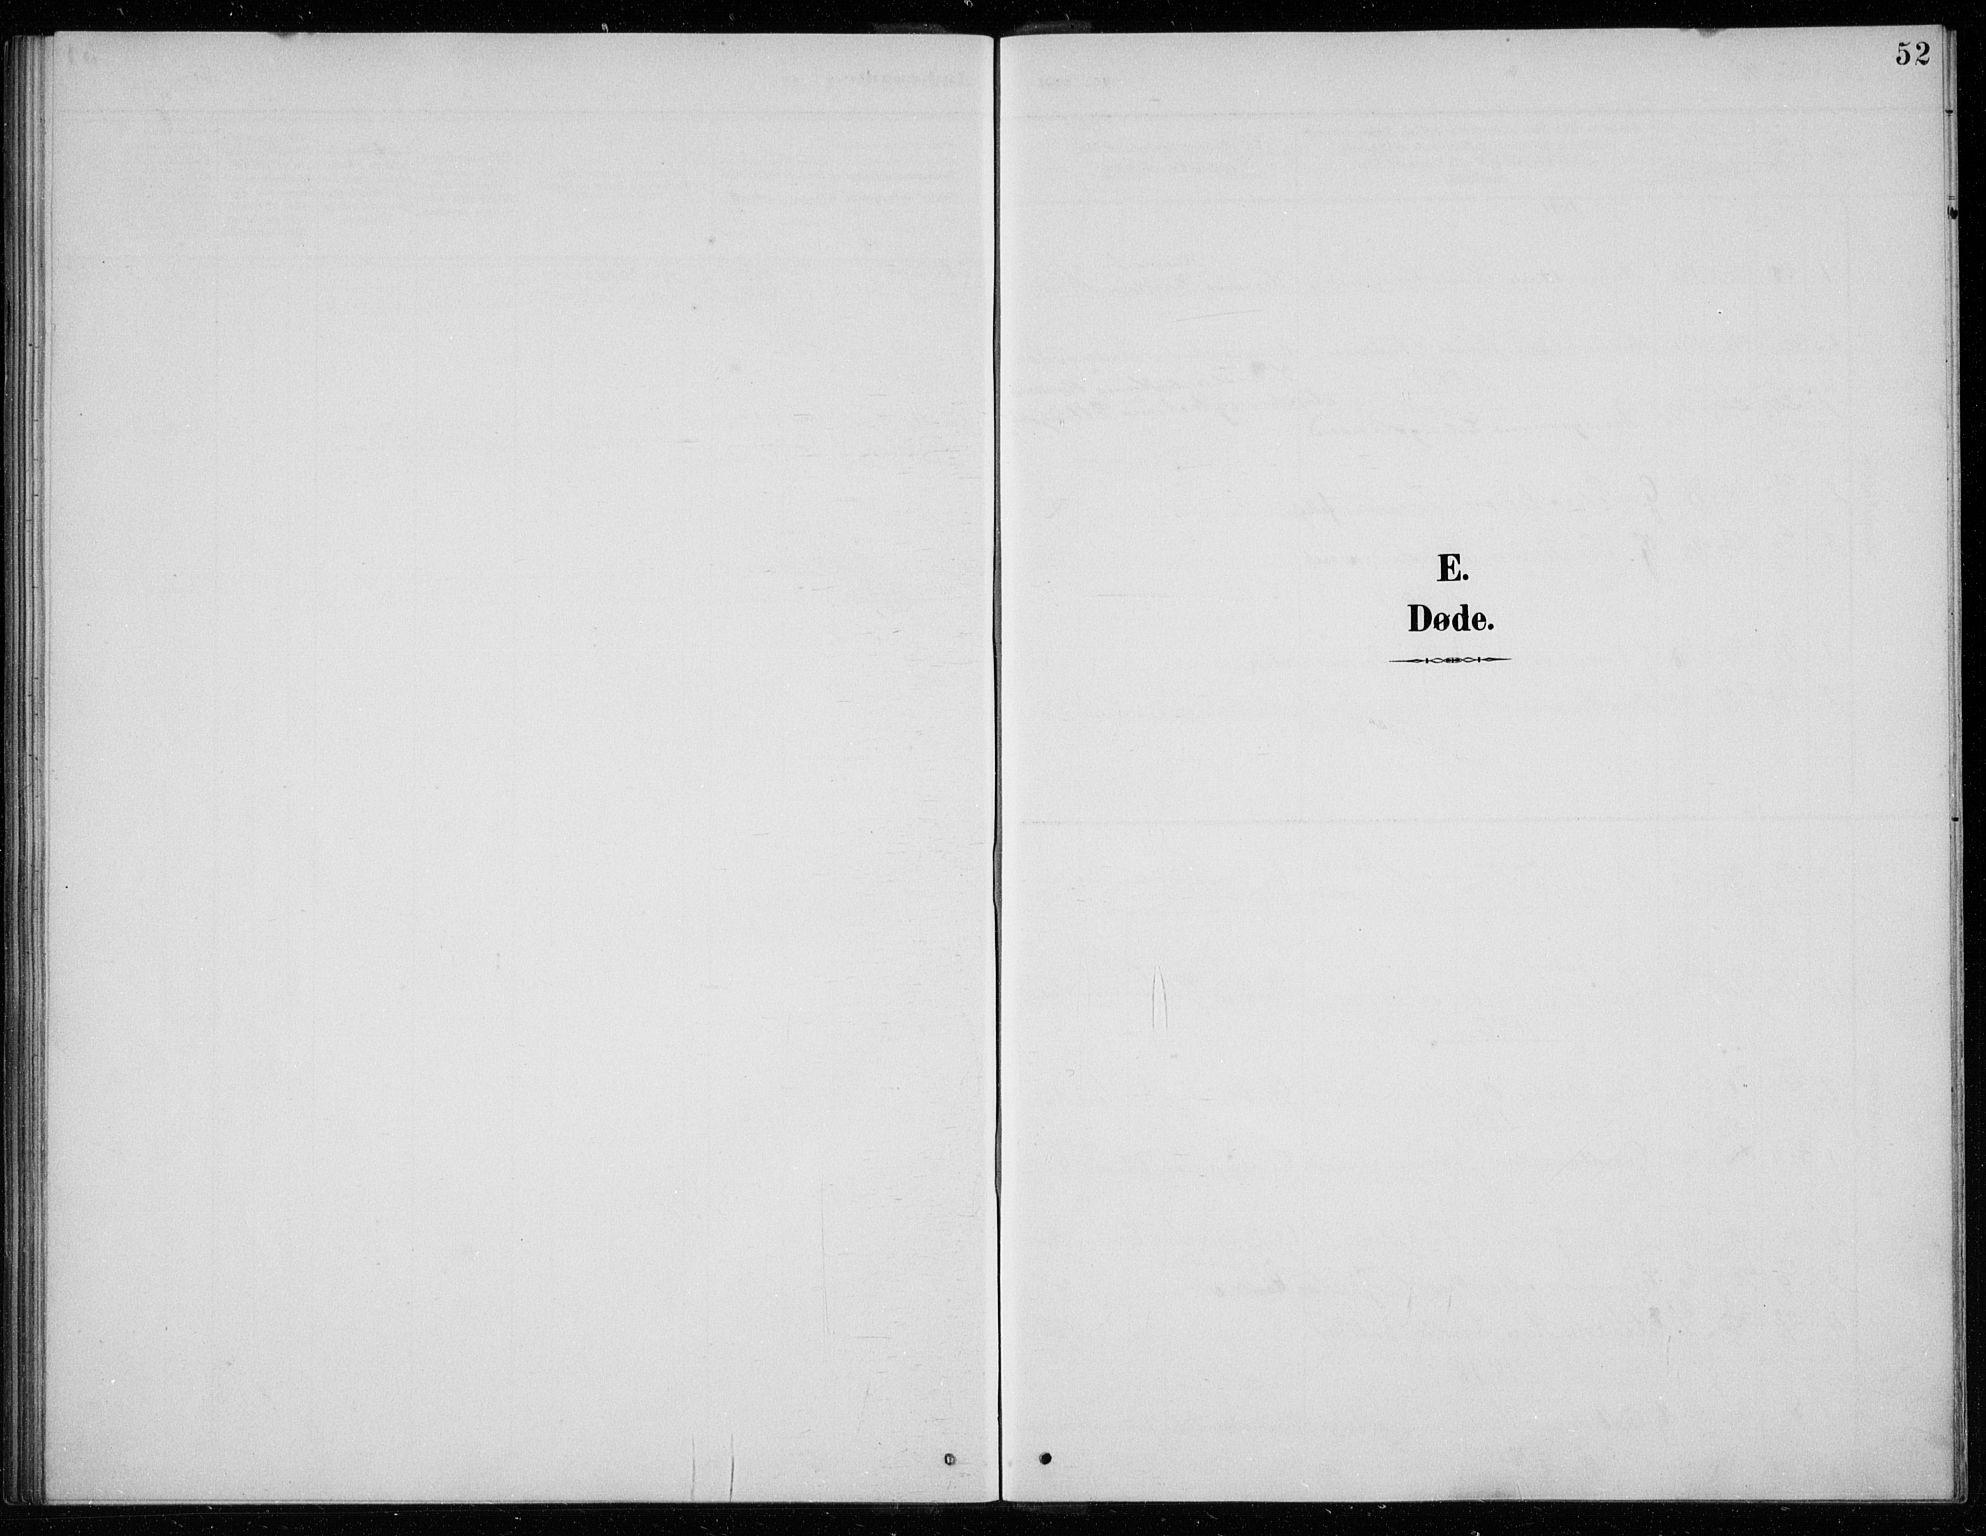 SAB, Balestrand sokneprestembete, H/Hab/Habc/L0003: Klokkerbok nr. C 3, 1895-1927, s. 52